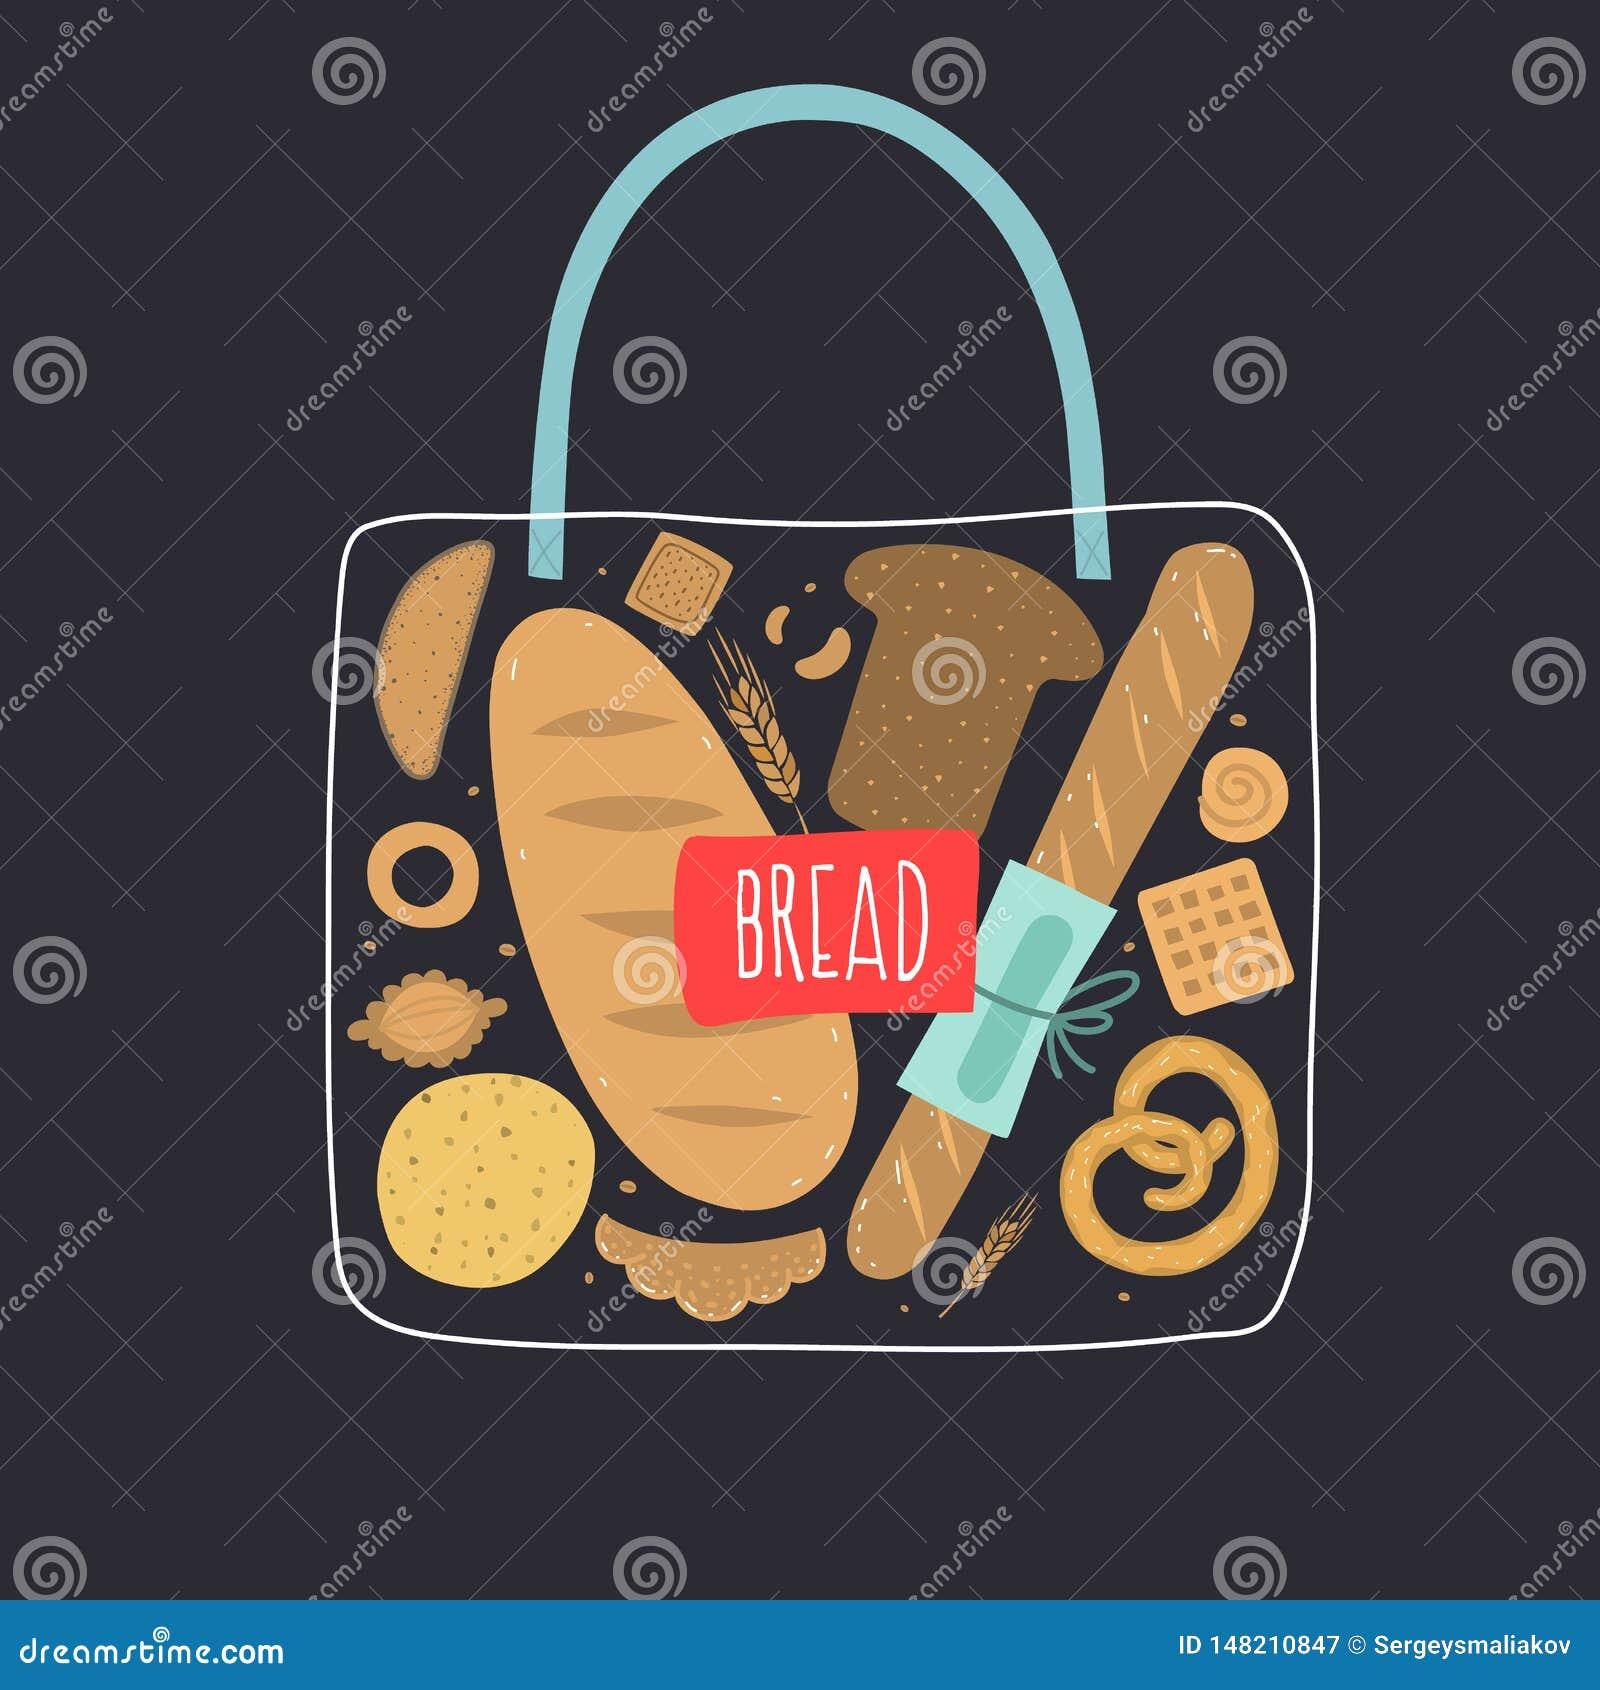 Bag of bread.